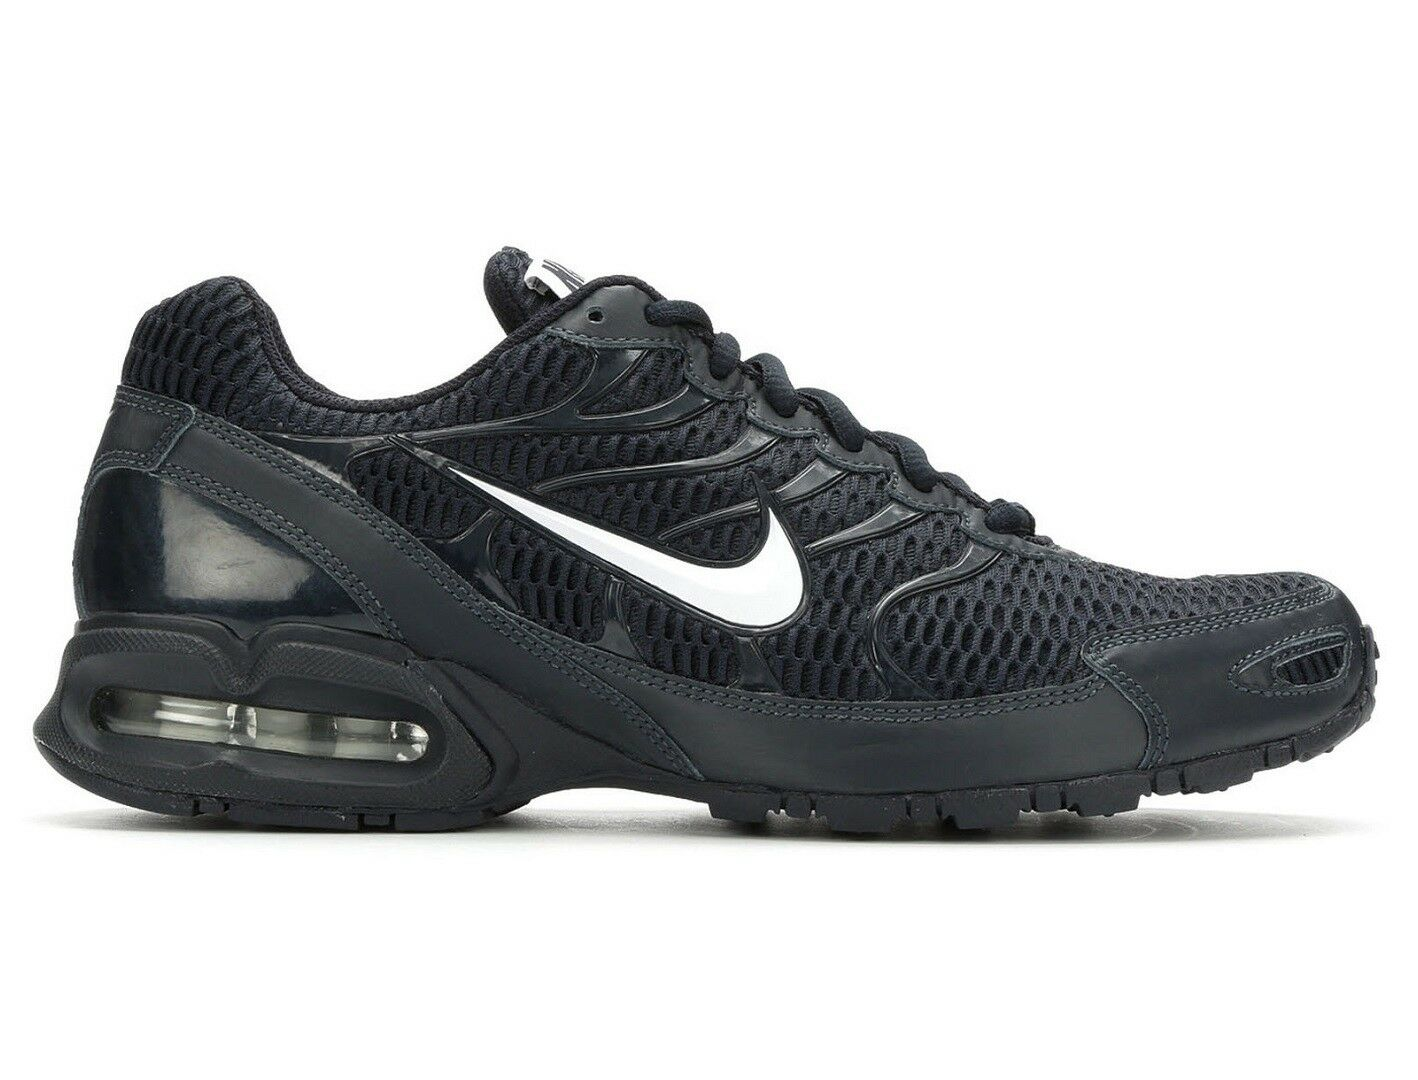 promo code 90d6c dc651 Nike Air Max Torcia 4 Uomini 343846-400 343846-400 343846-400 Buio